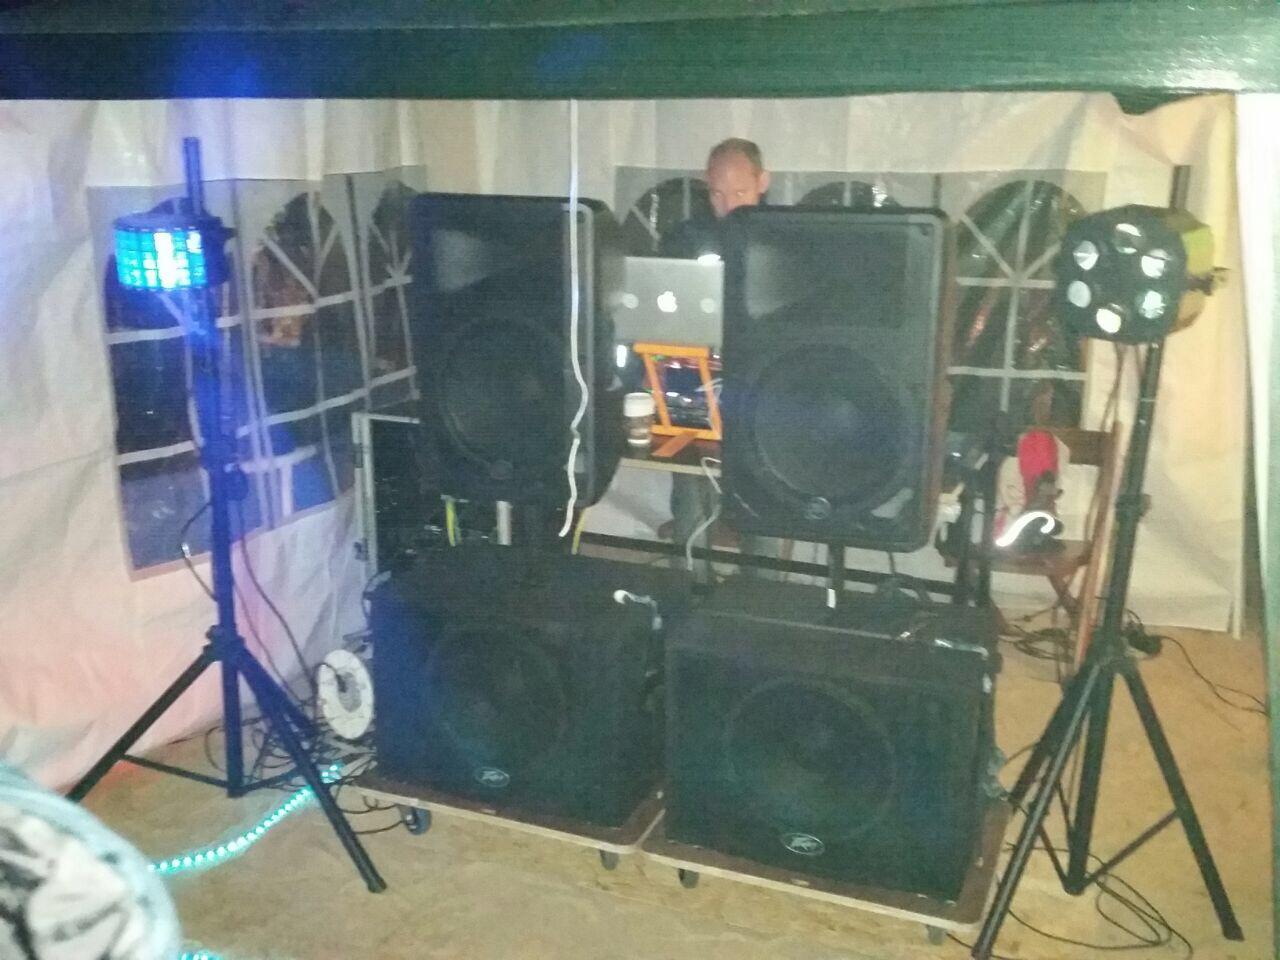 Technik für Events bis 5000 Gäste - Event - Party | DJ TONY P